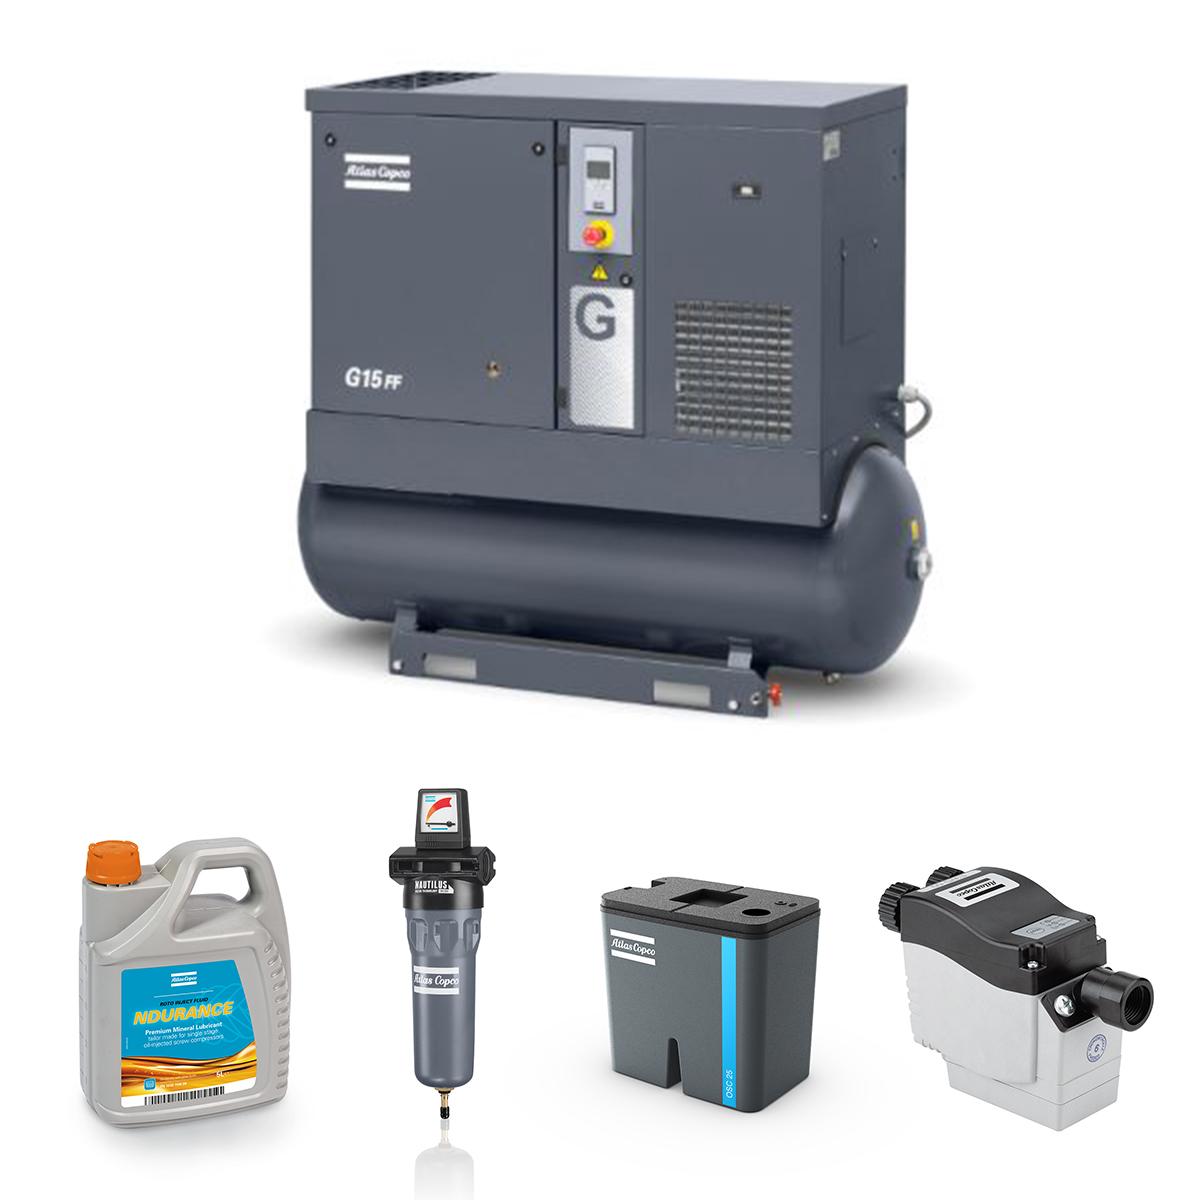 18kW Screw Compressed Air Bundle: Compressor, Separator, Filter, Drain, Oil